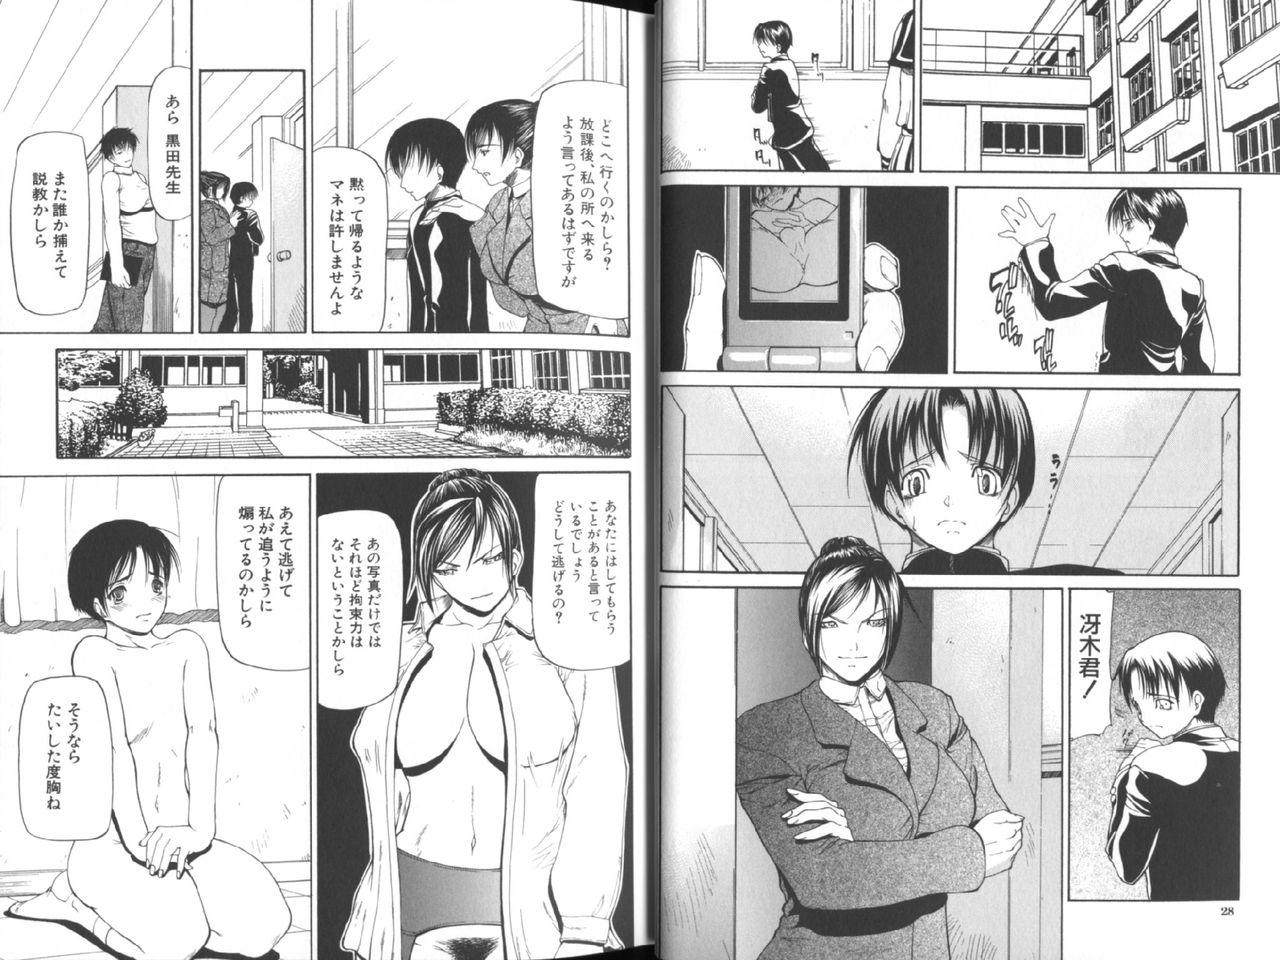 Senjou - A Desire is Instigated 15